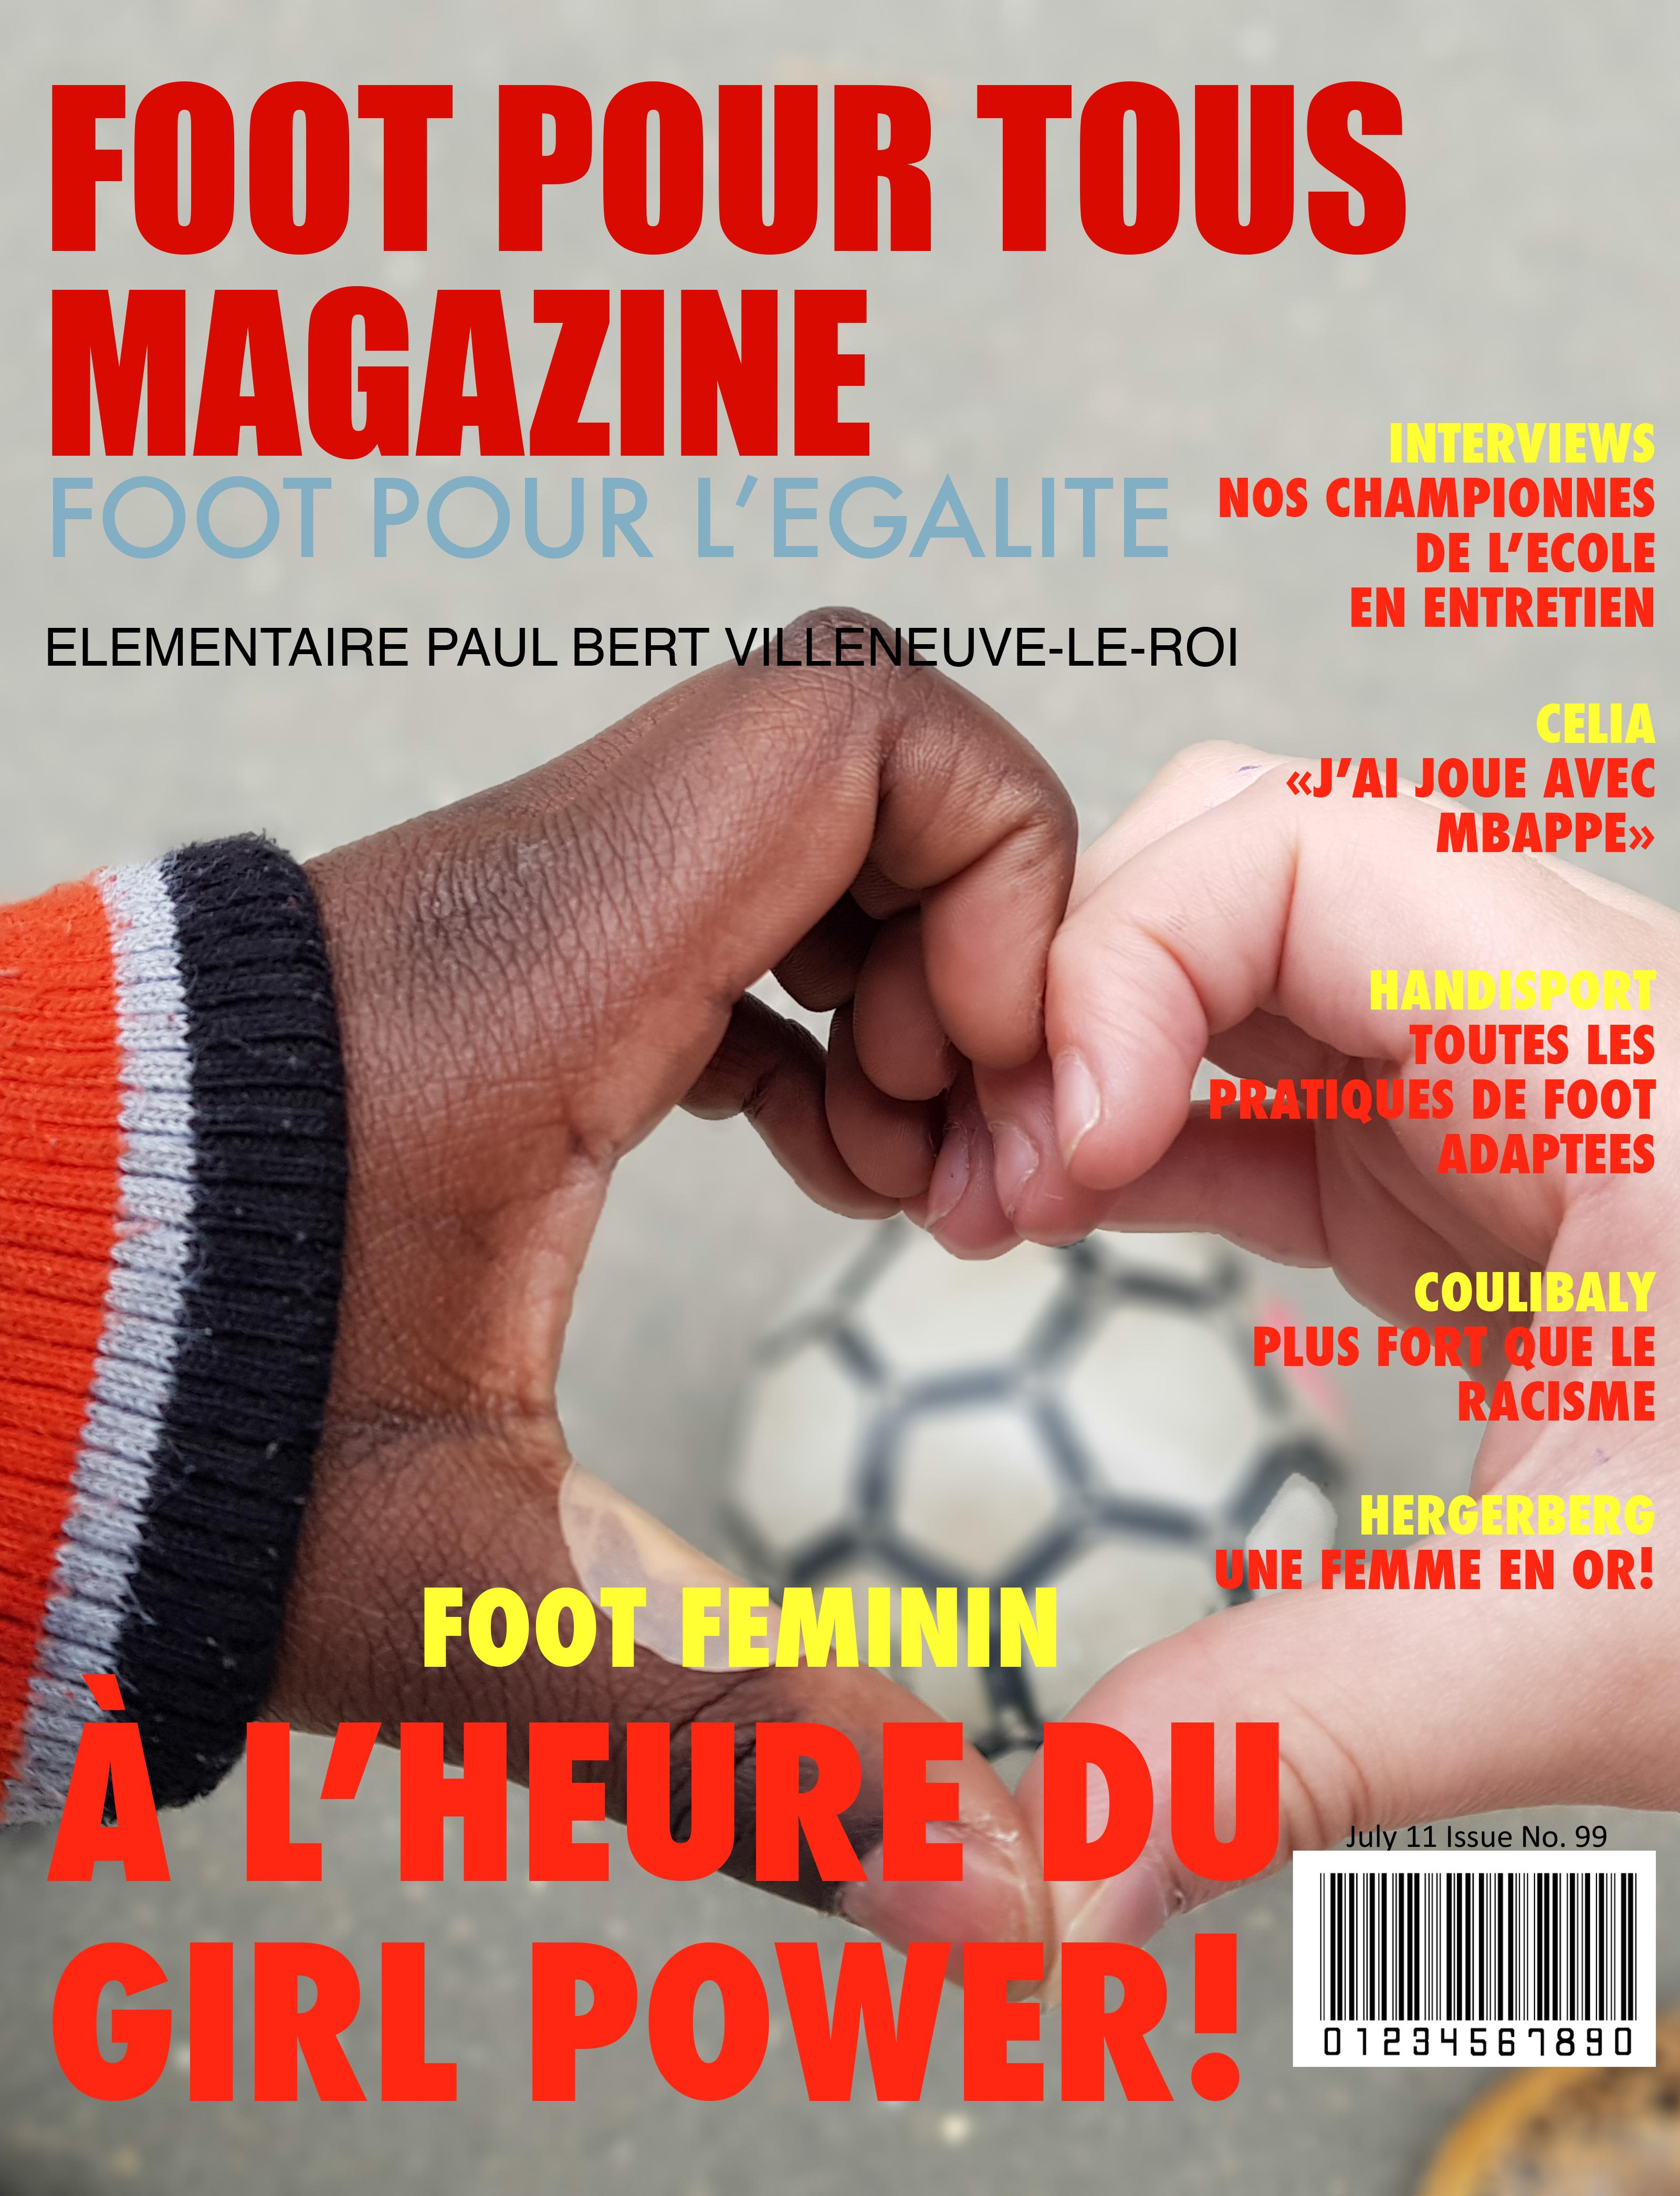 Foot pour tous magazine